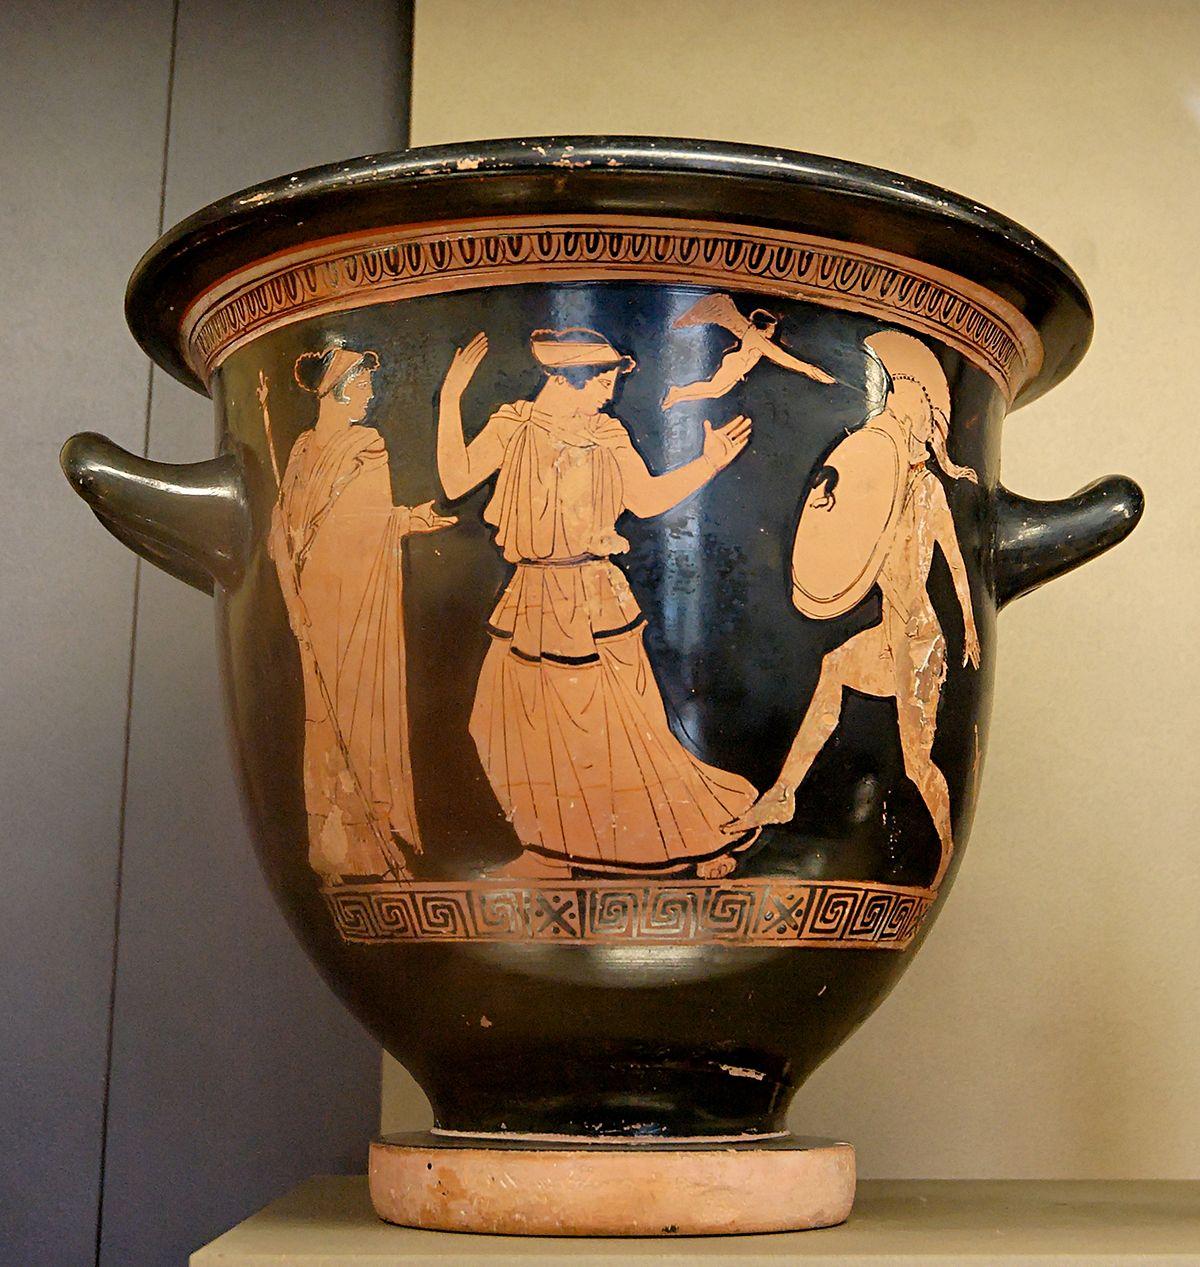 Grekisk mytologi wikipedia for Vas al